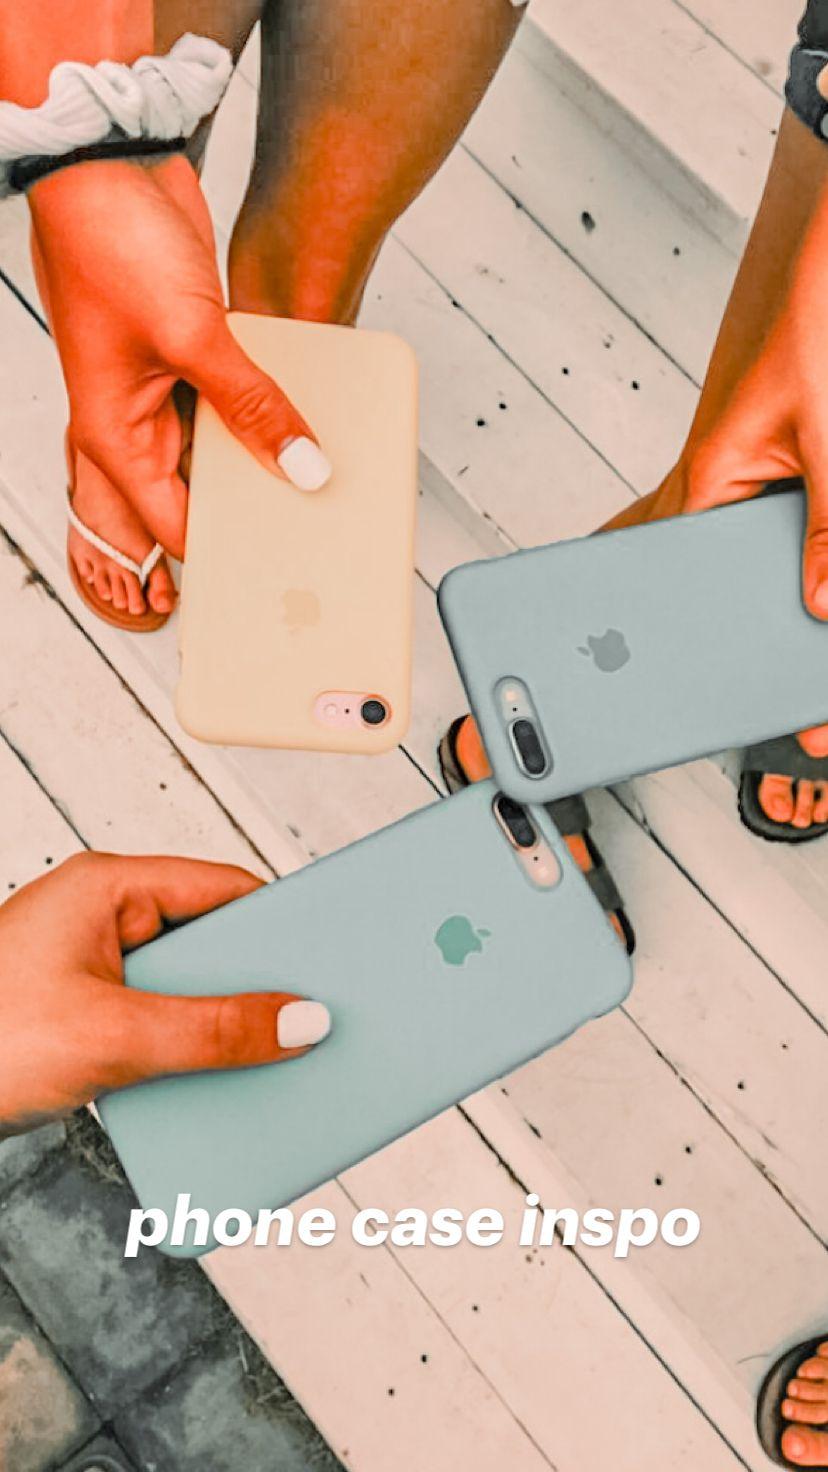 phone case inspo